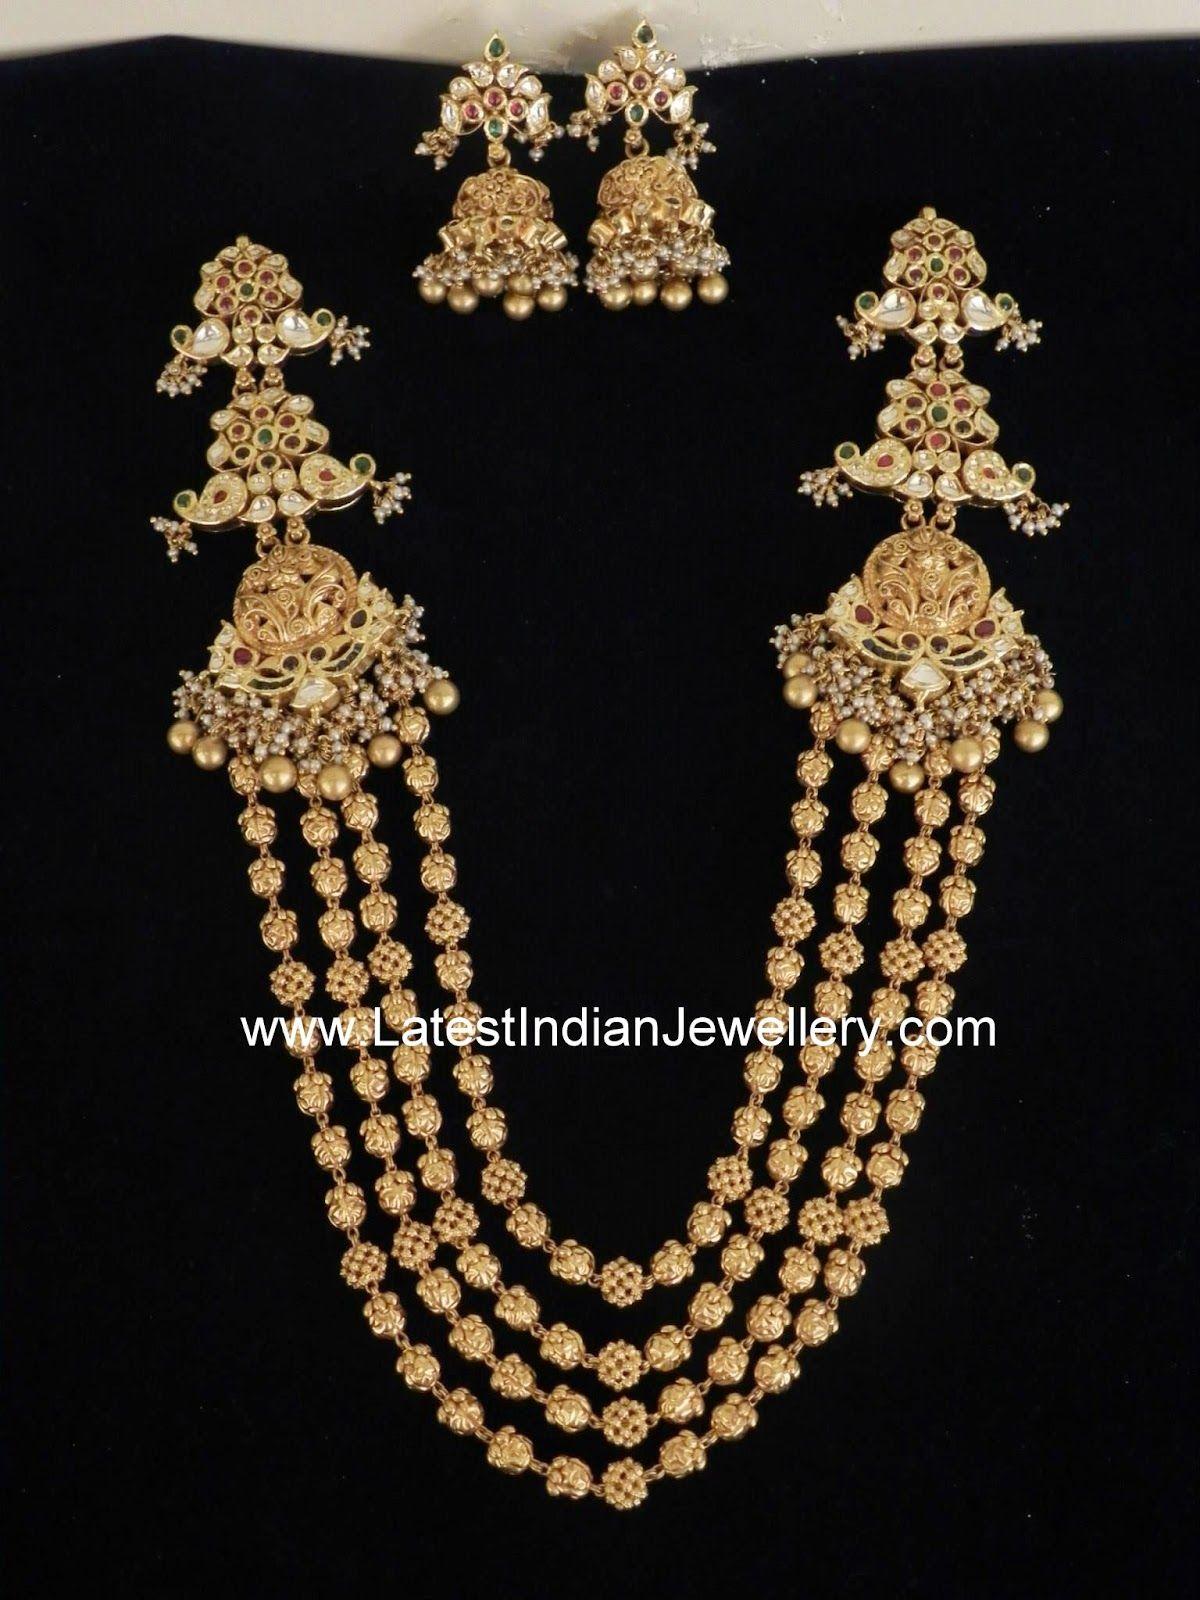 And contemporary gold jhumkas collection by khazana jewellery - Gold Gundla Mala Chandra Haram Wedding Jewellery Designswedding